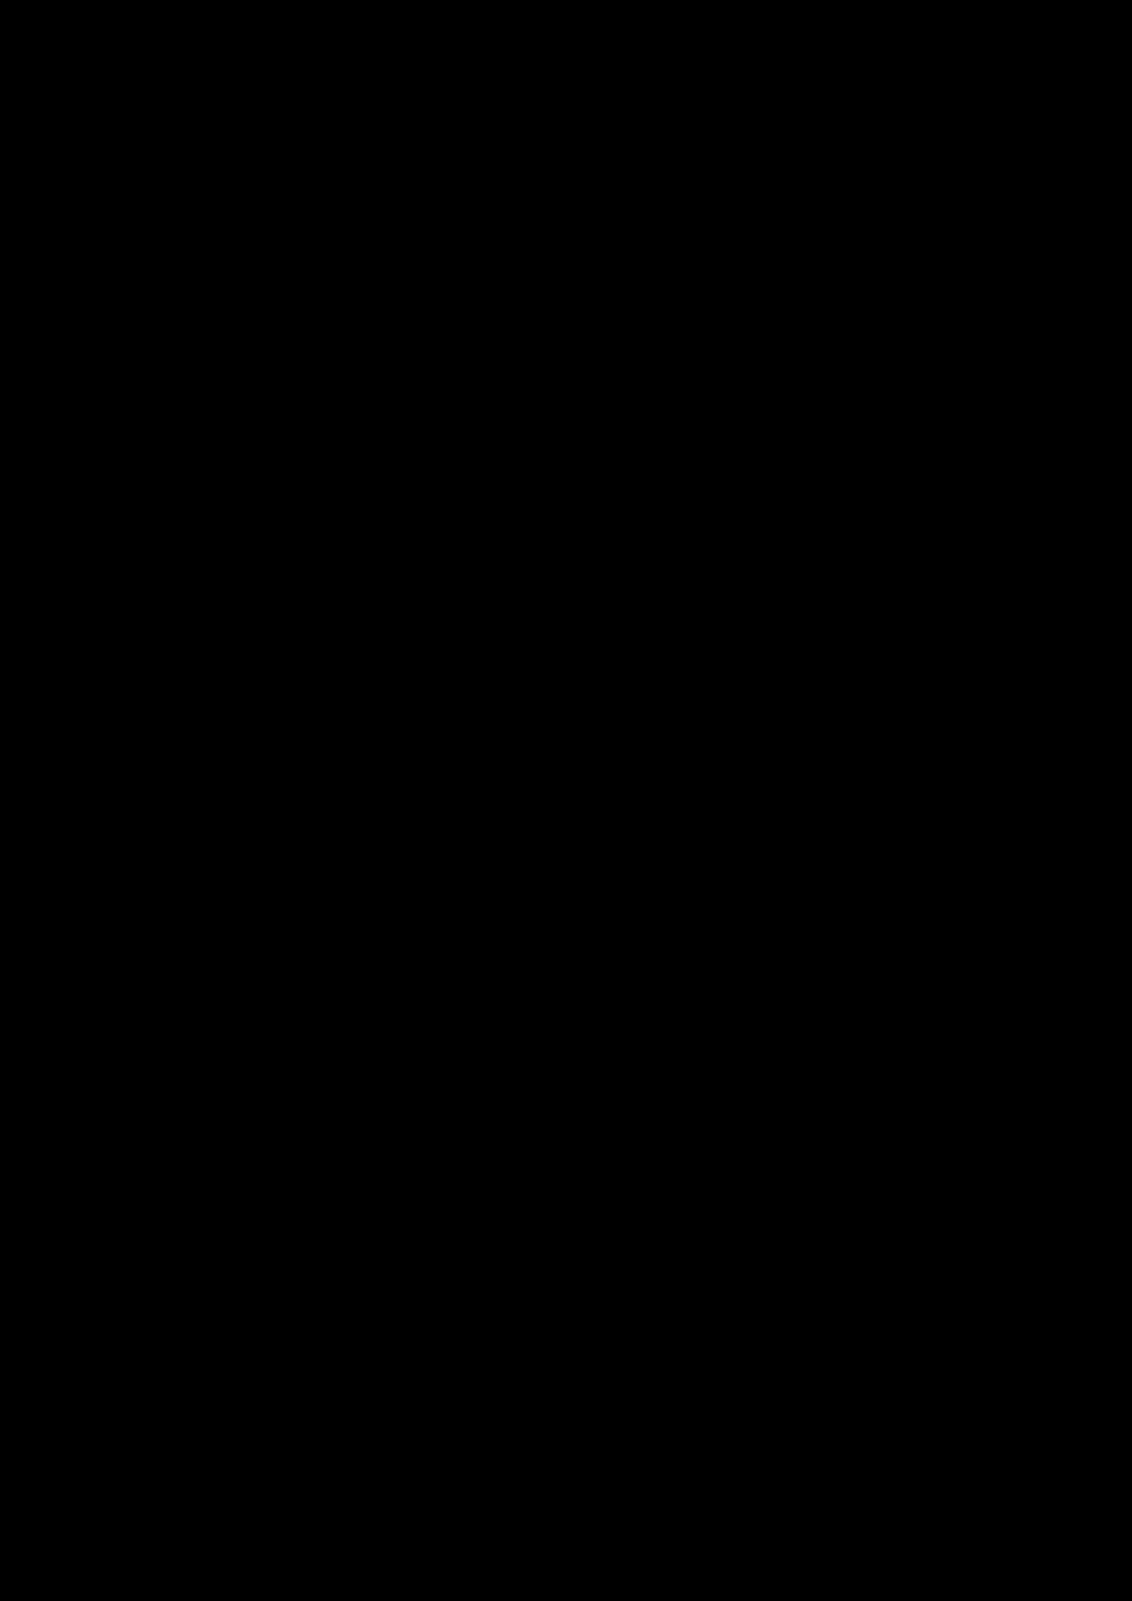 Mrs. Vandebilt slide, Image 39